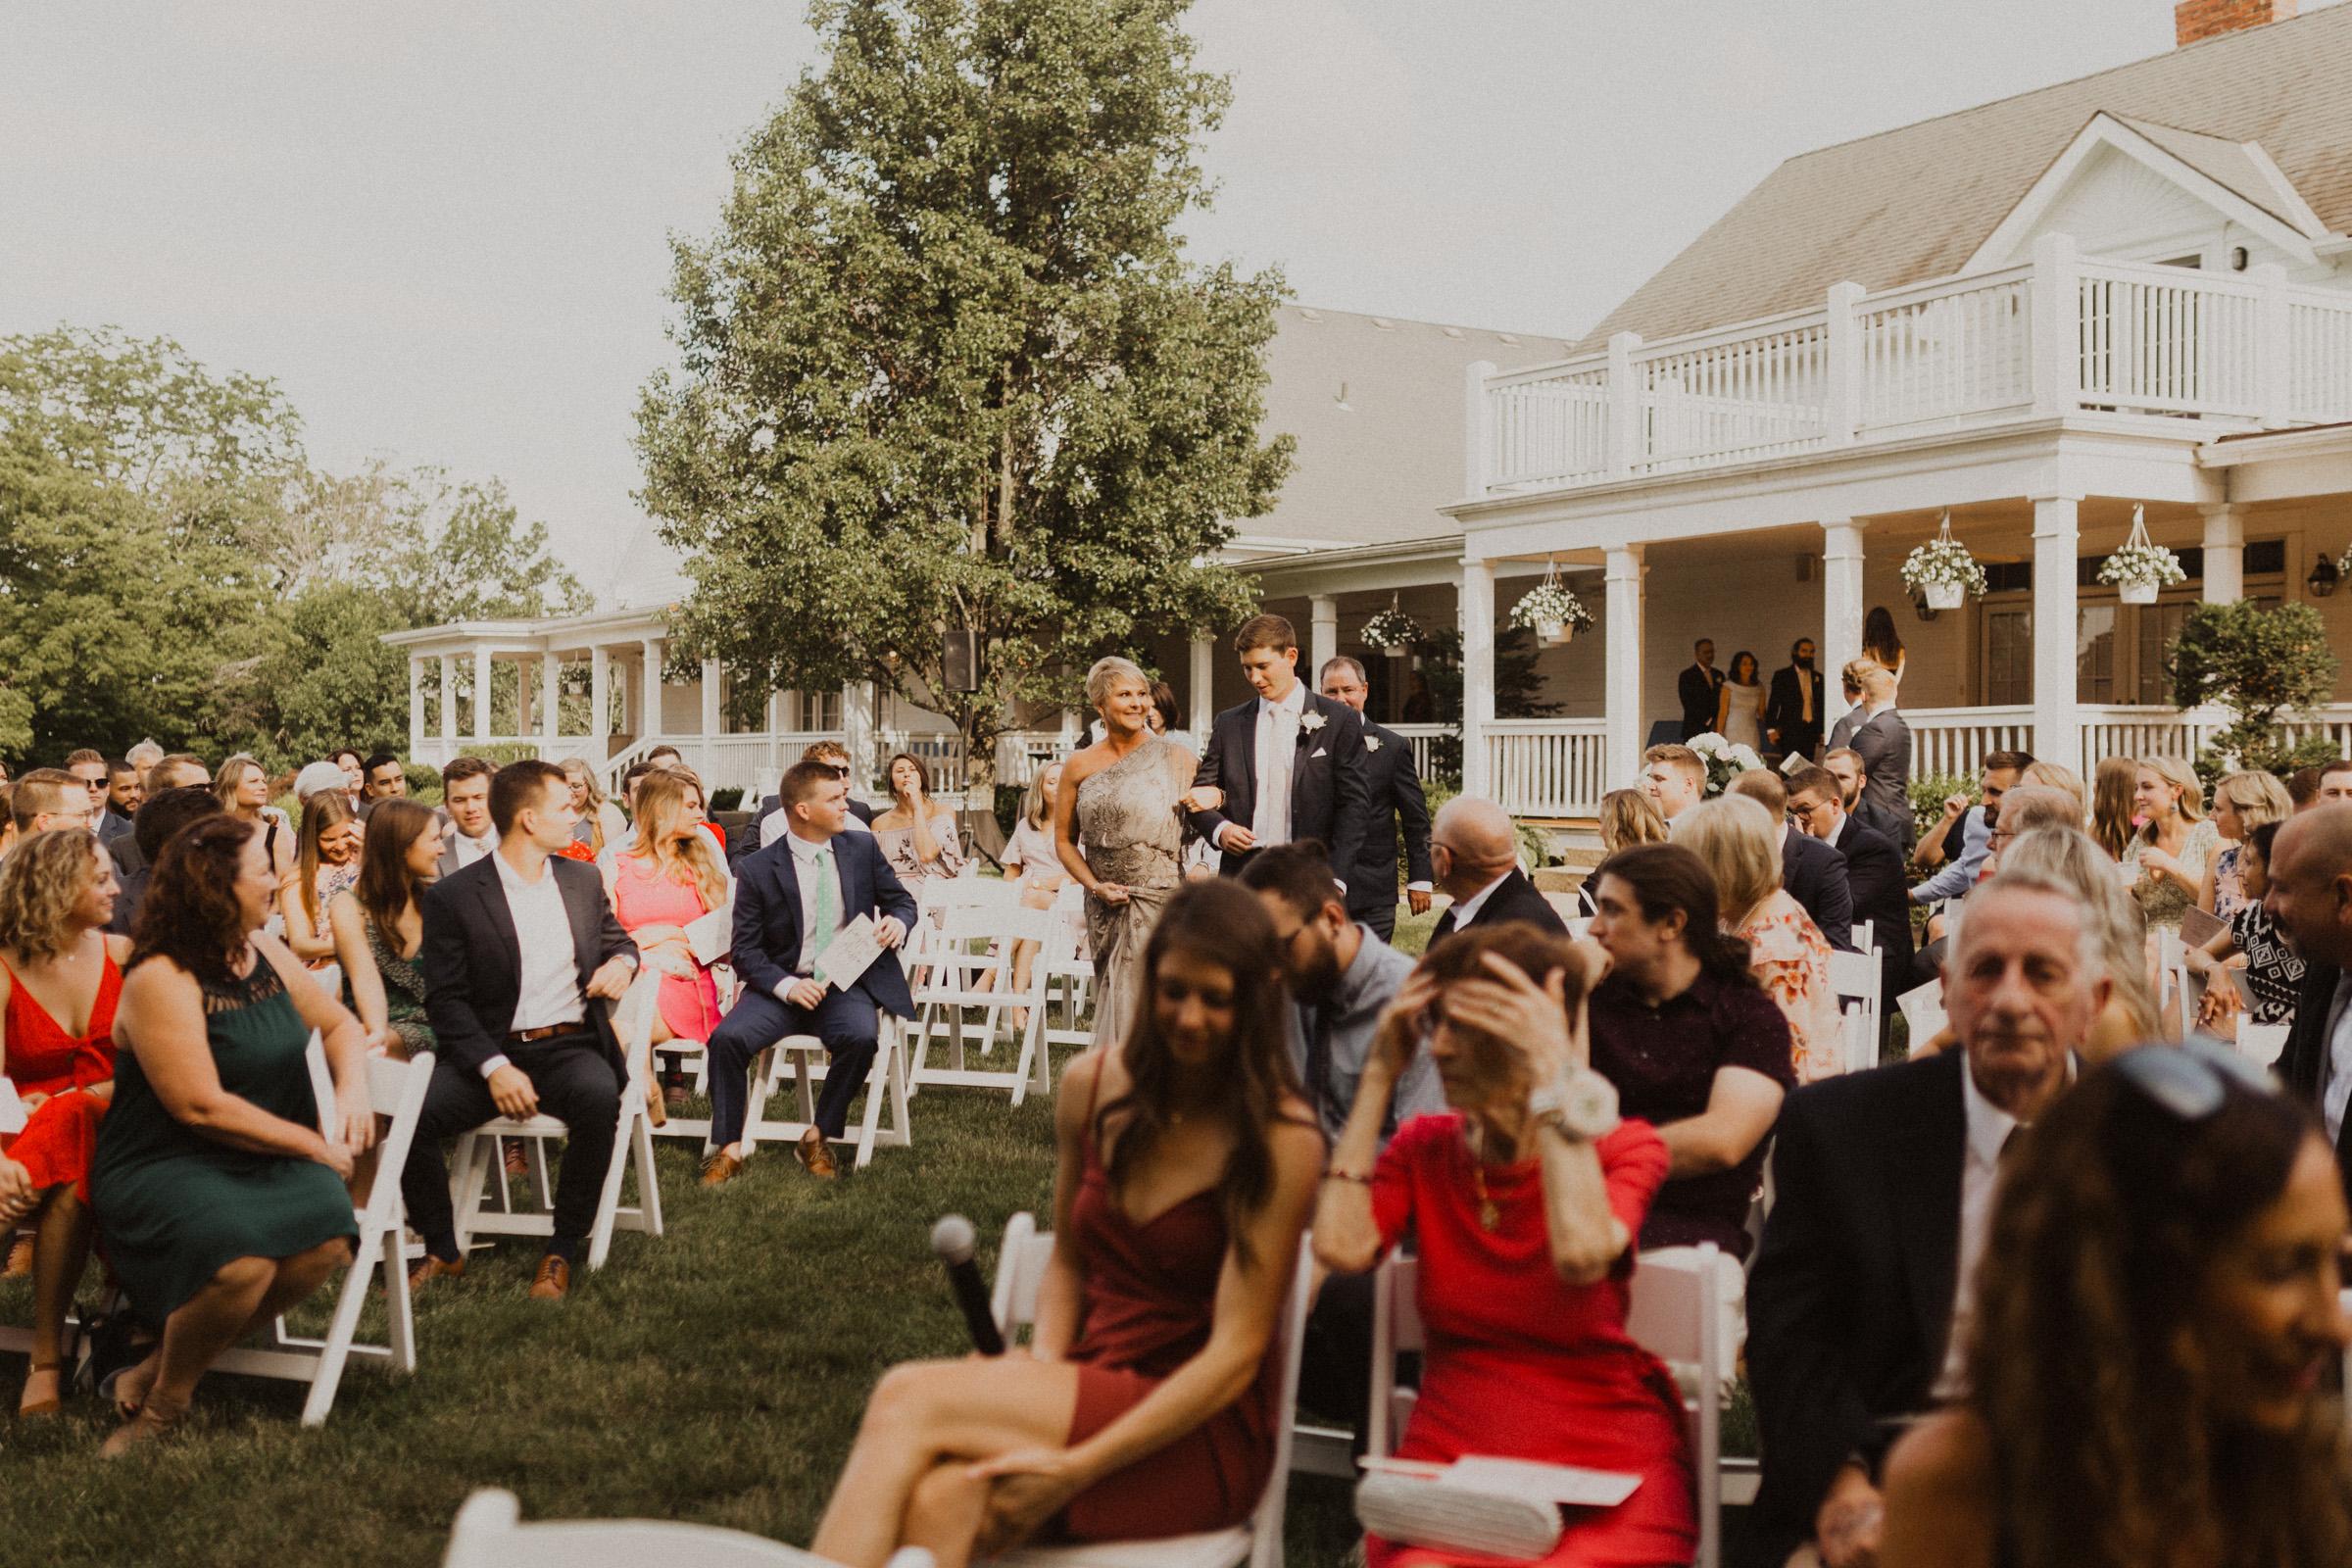 alyssa barletter photography hawthorne house summer outdoor wedding southern charm inspiration-40.jpg